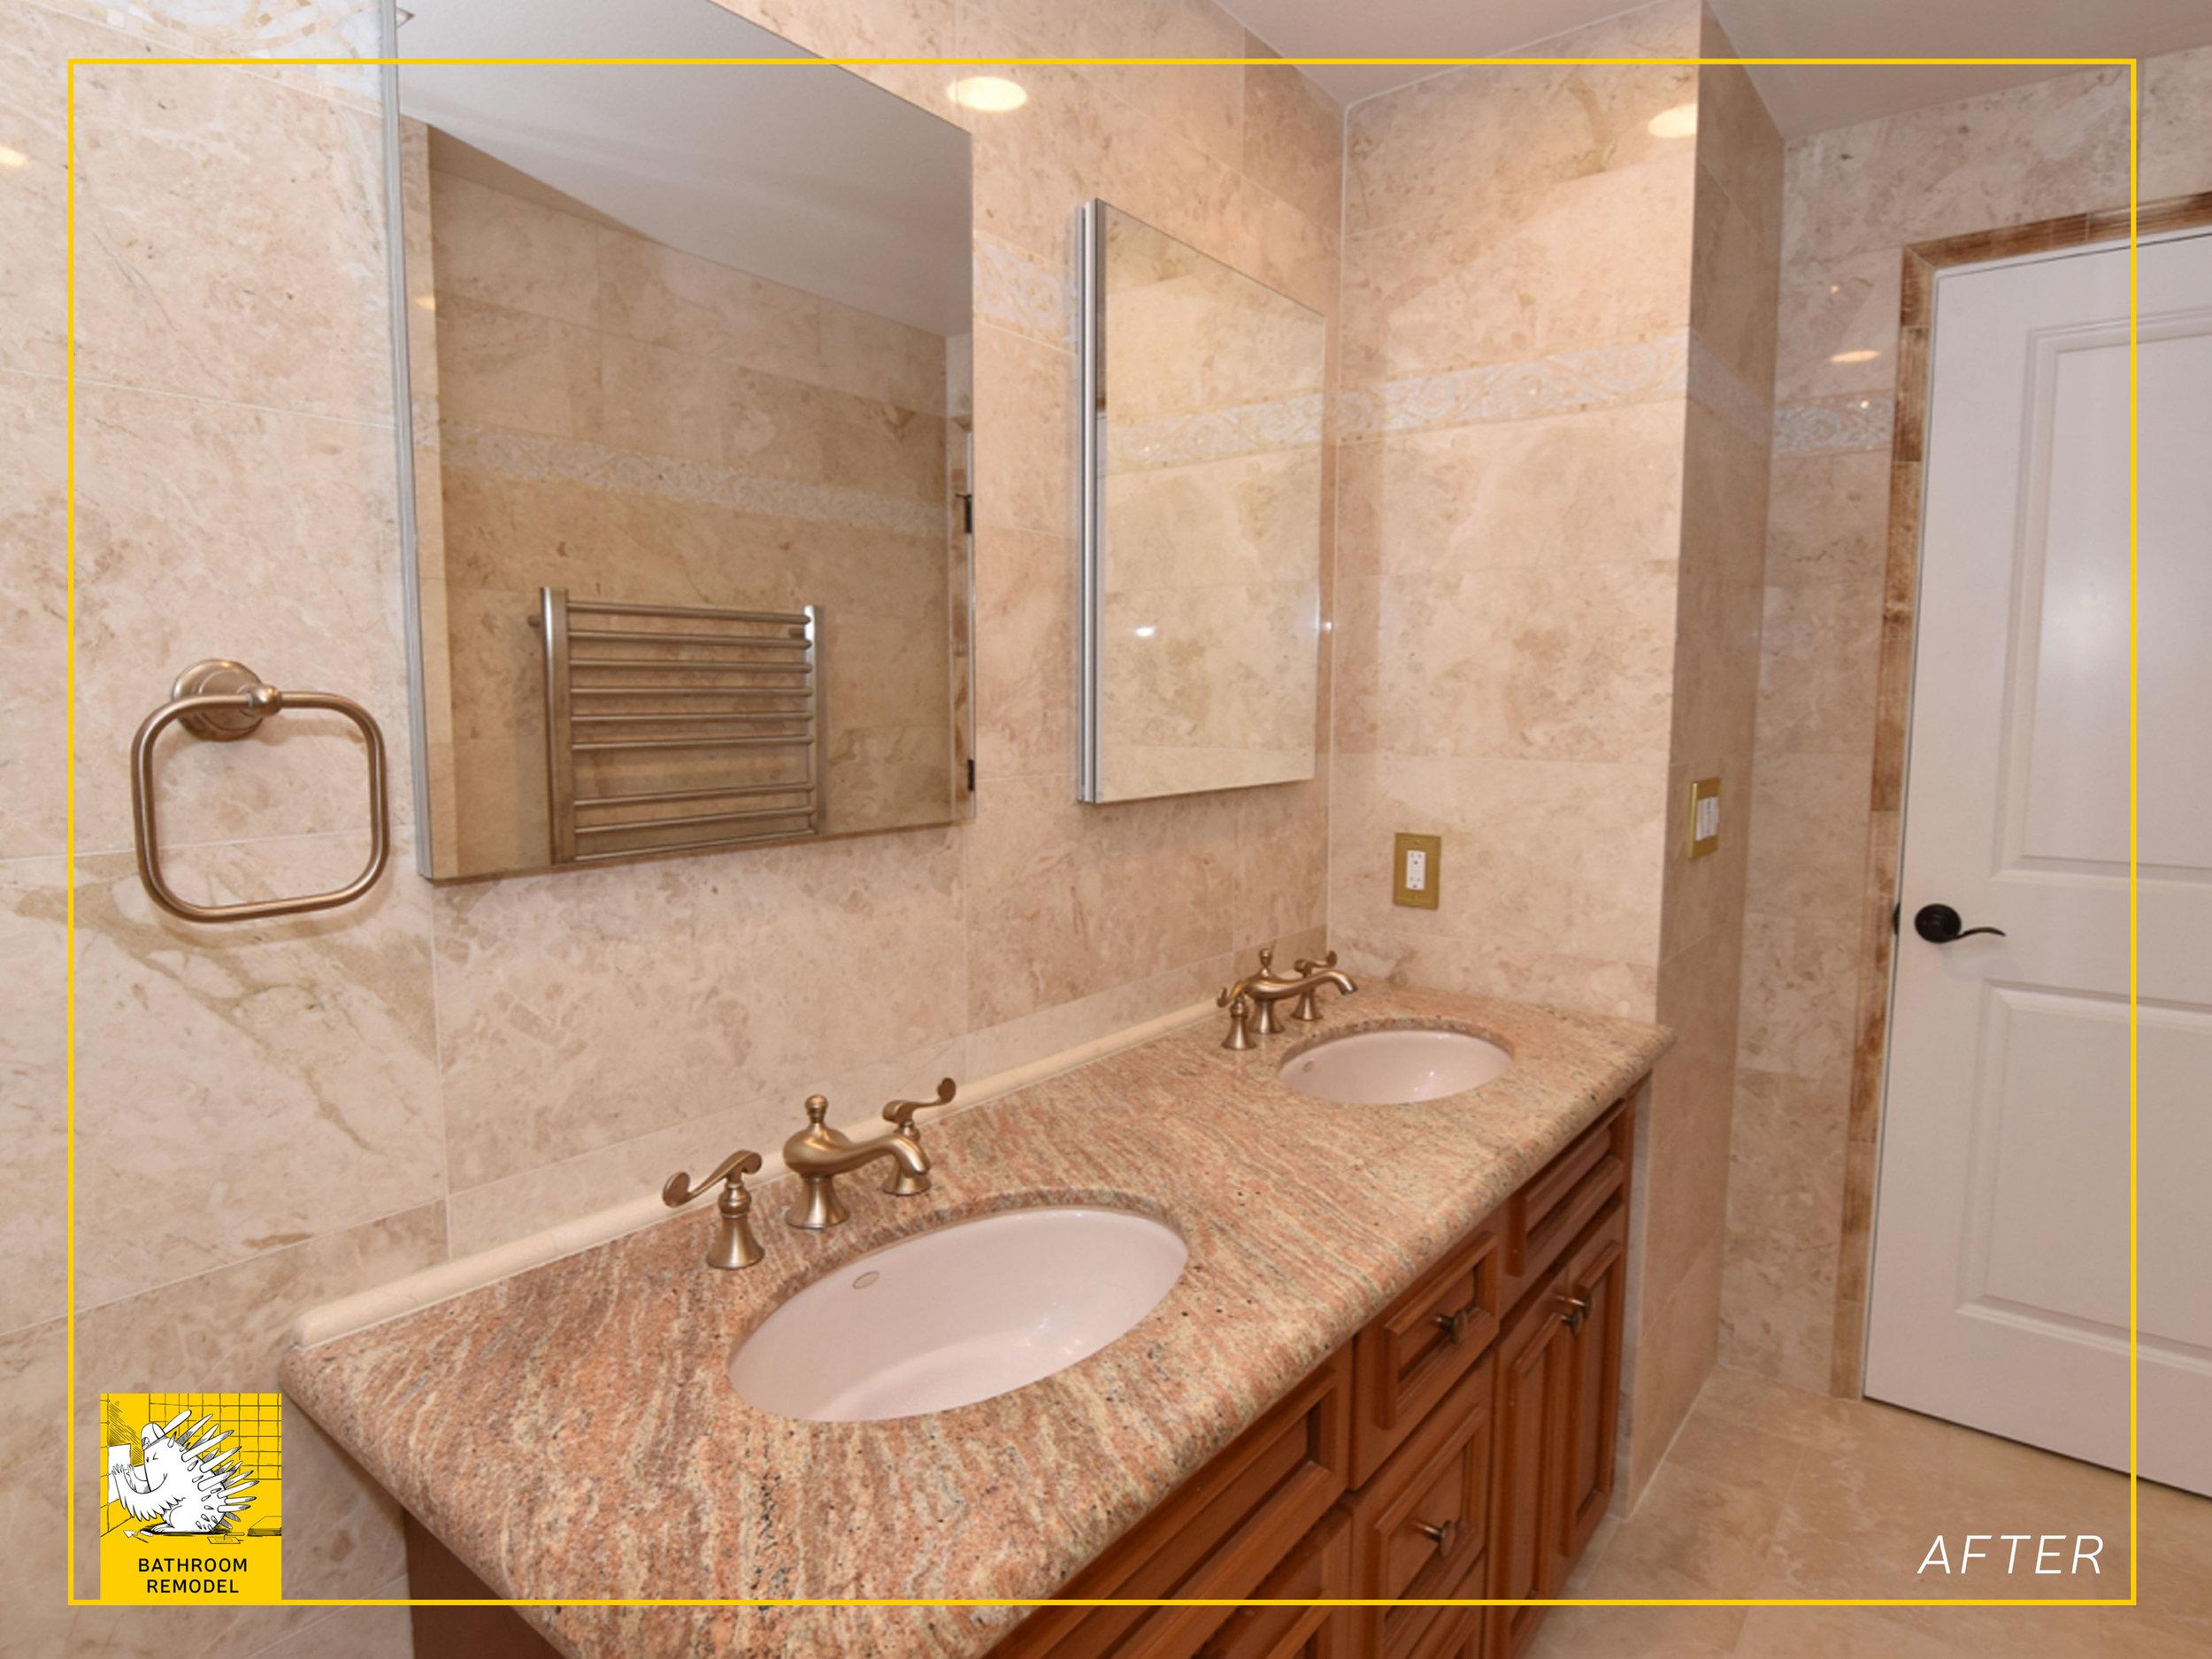 MT bathroom 2 after 2.jpg